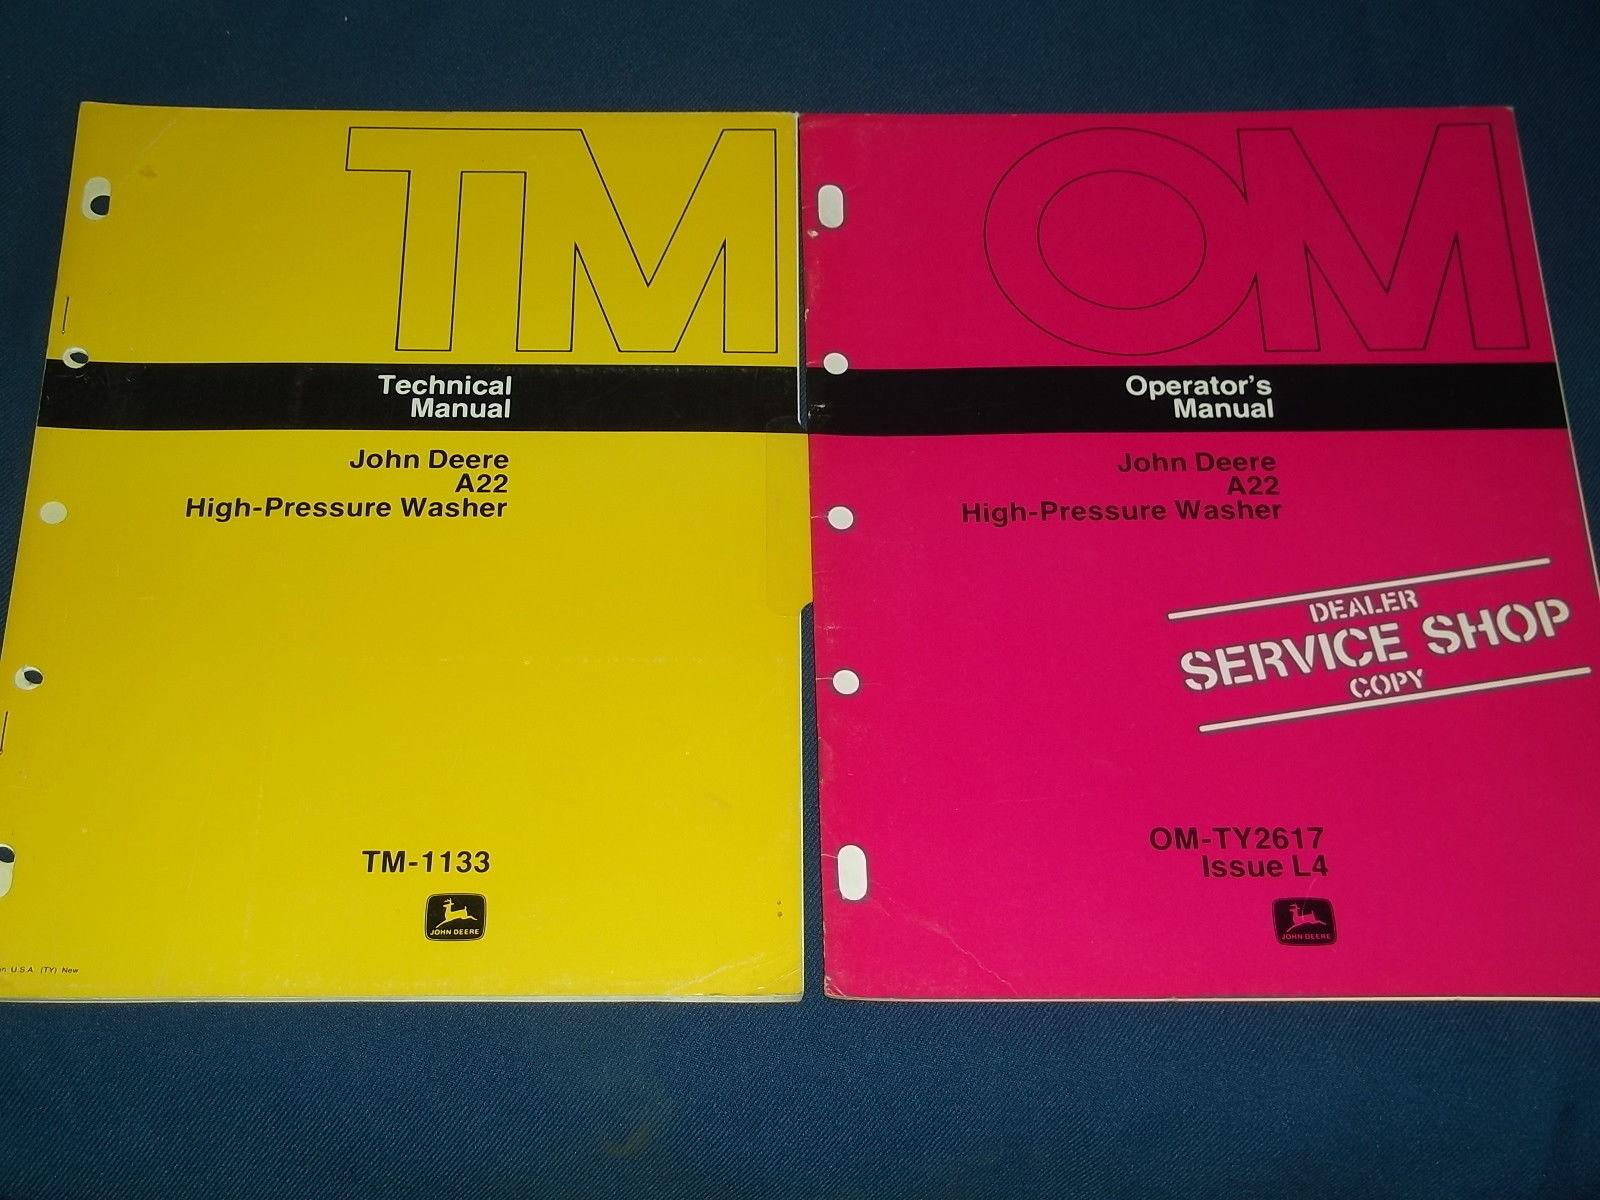 John Deere Manuales de taller - Service manuals- repair manuals